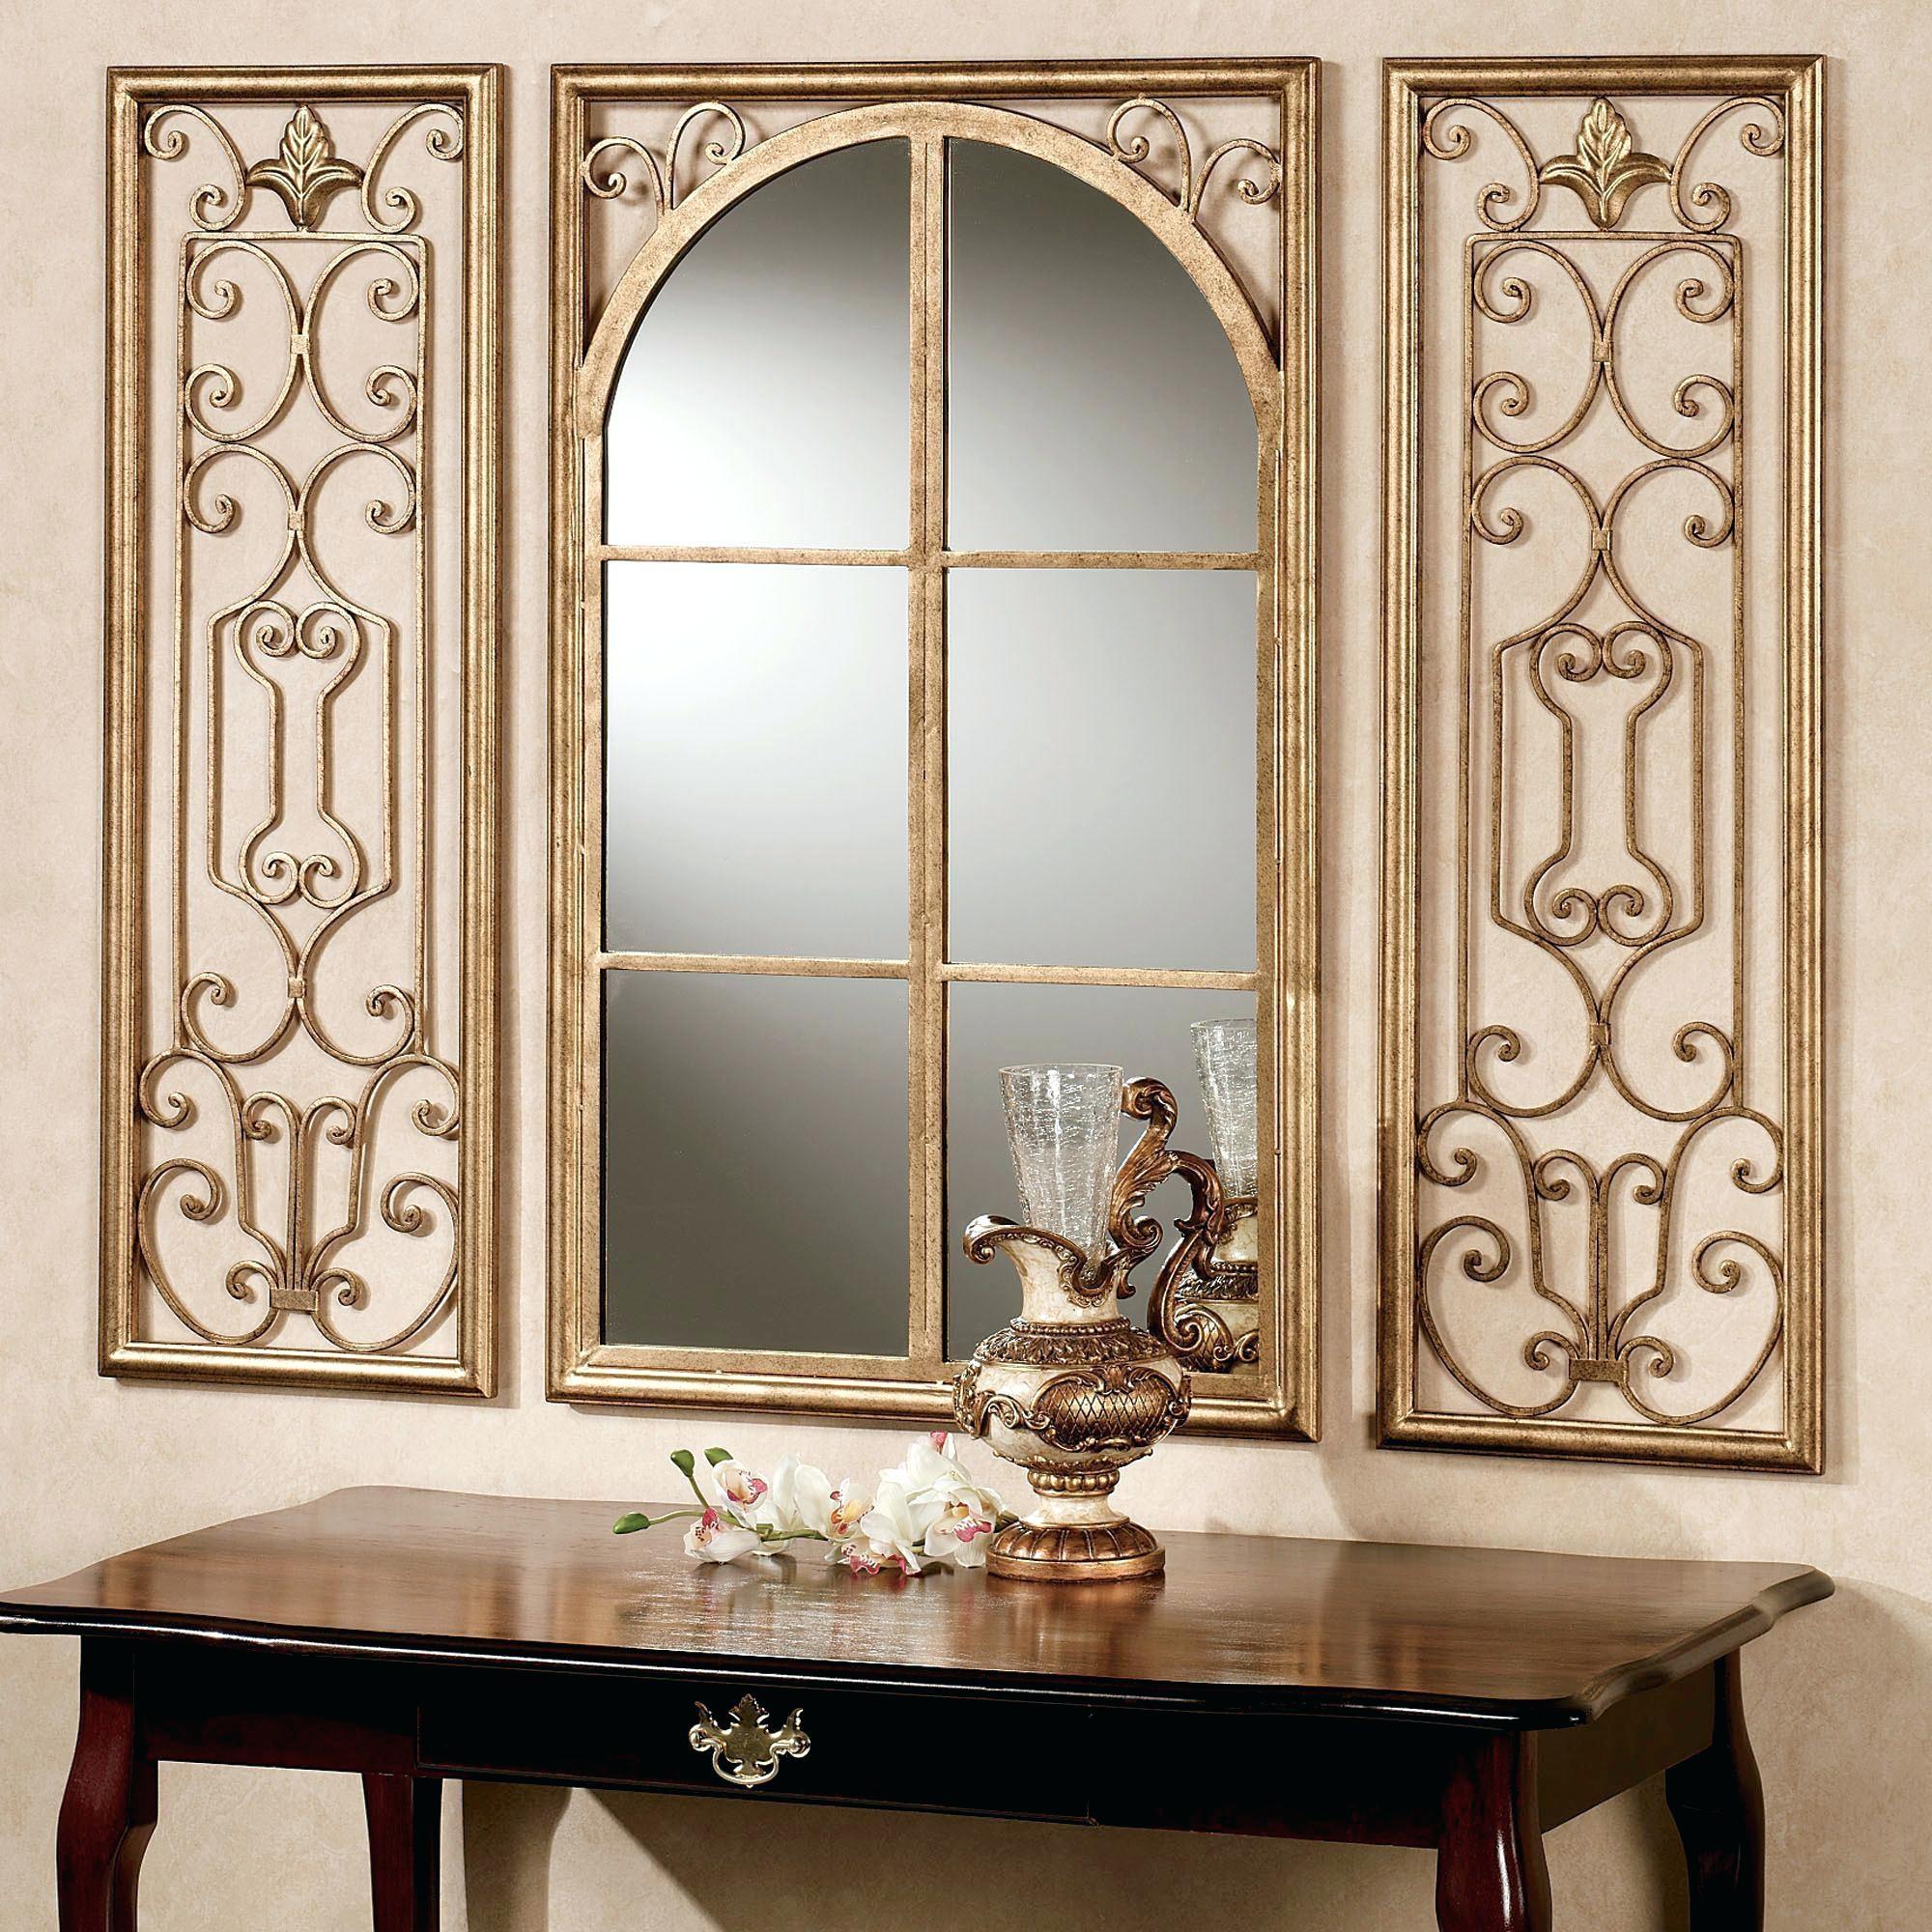 Living Gold Traditional Framed Wall Mirror Living Gold Traditional Framed Wall Mirror gold framed wall mirror shopwiz 2000 X 2000